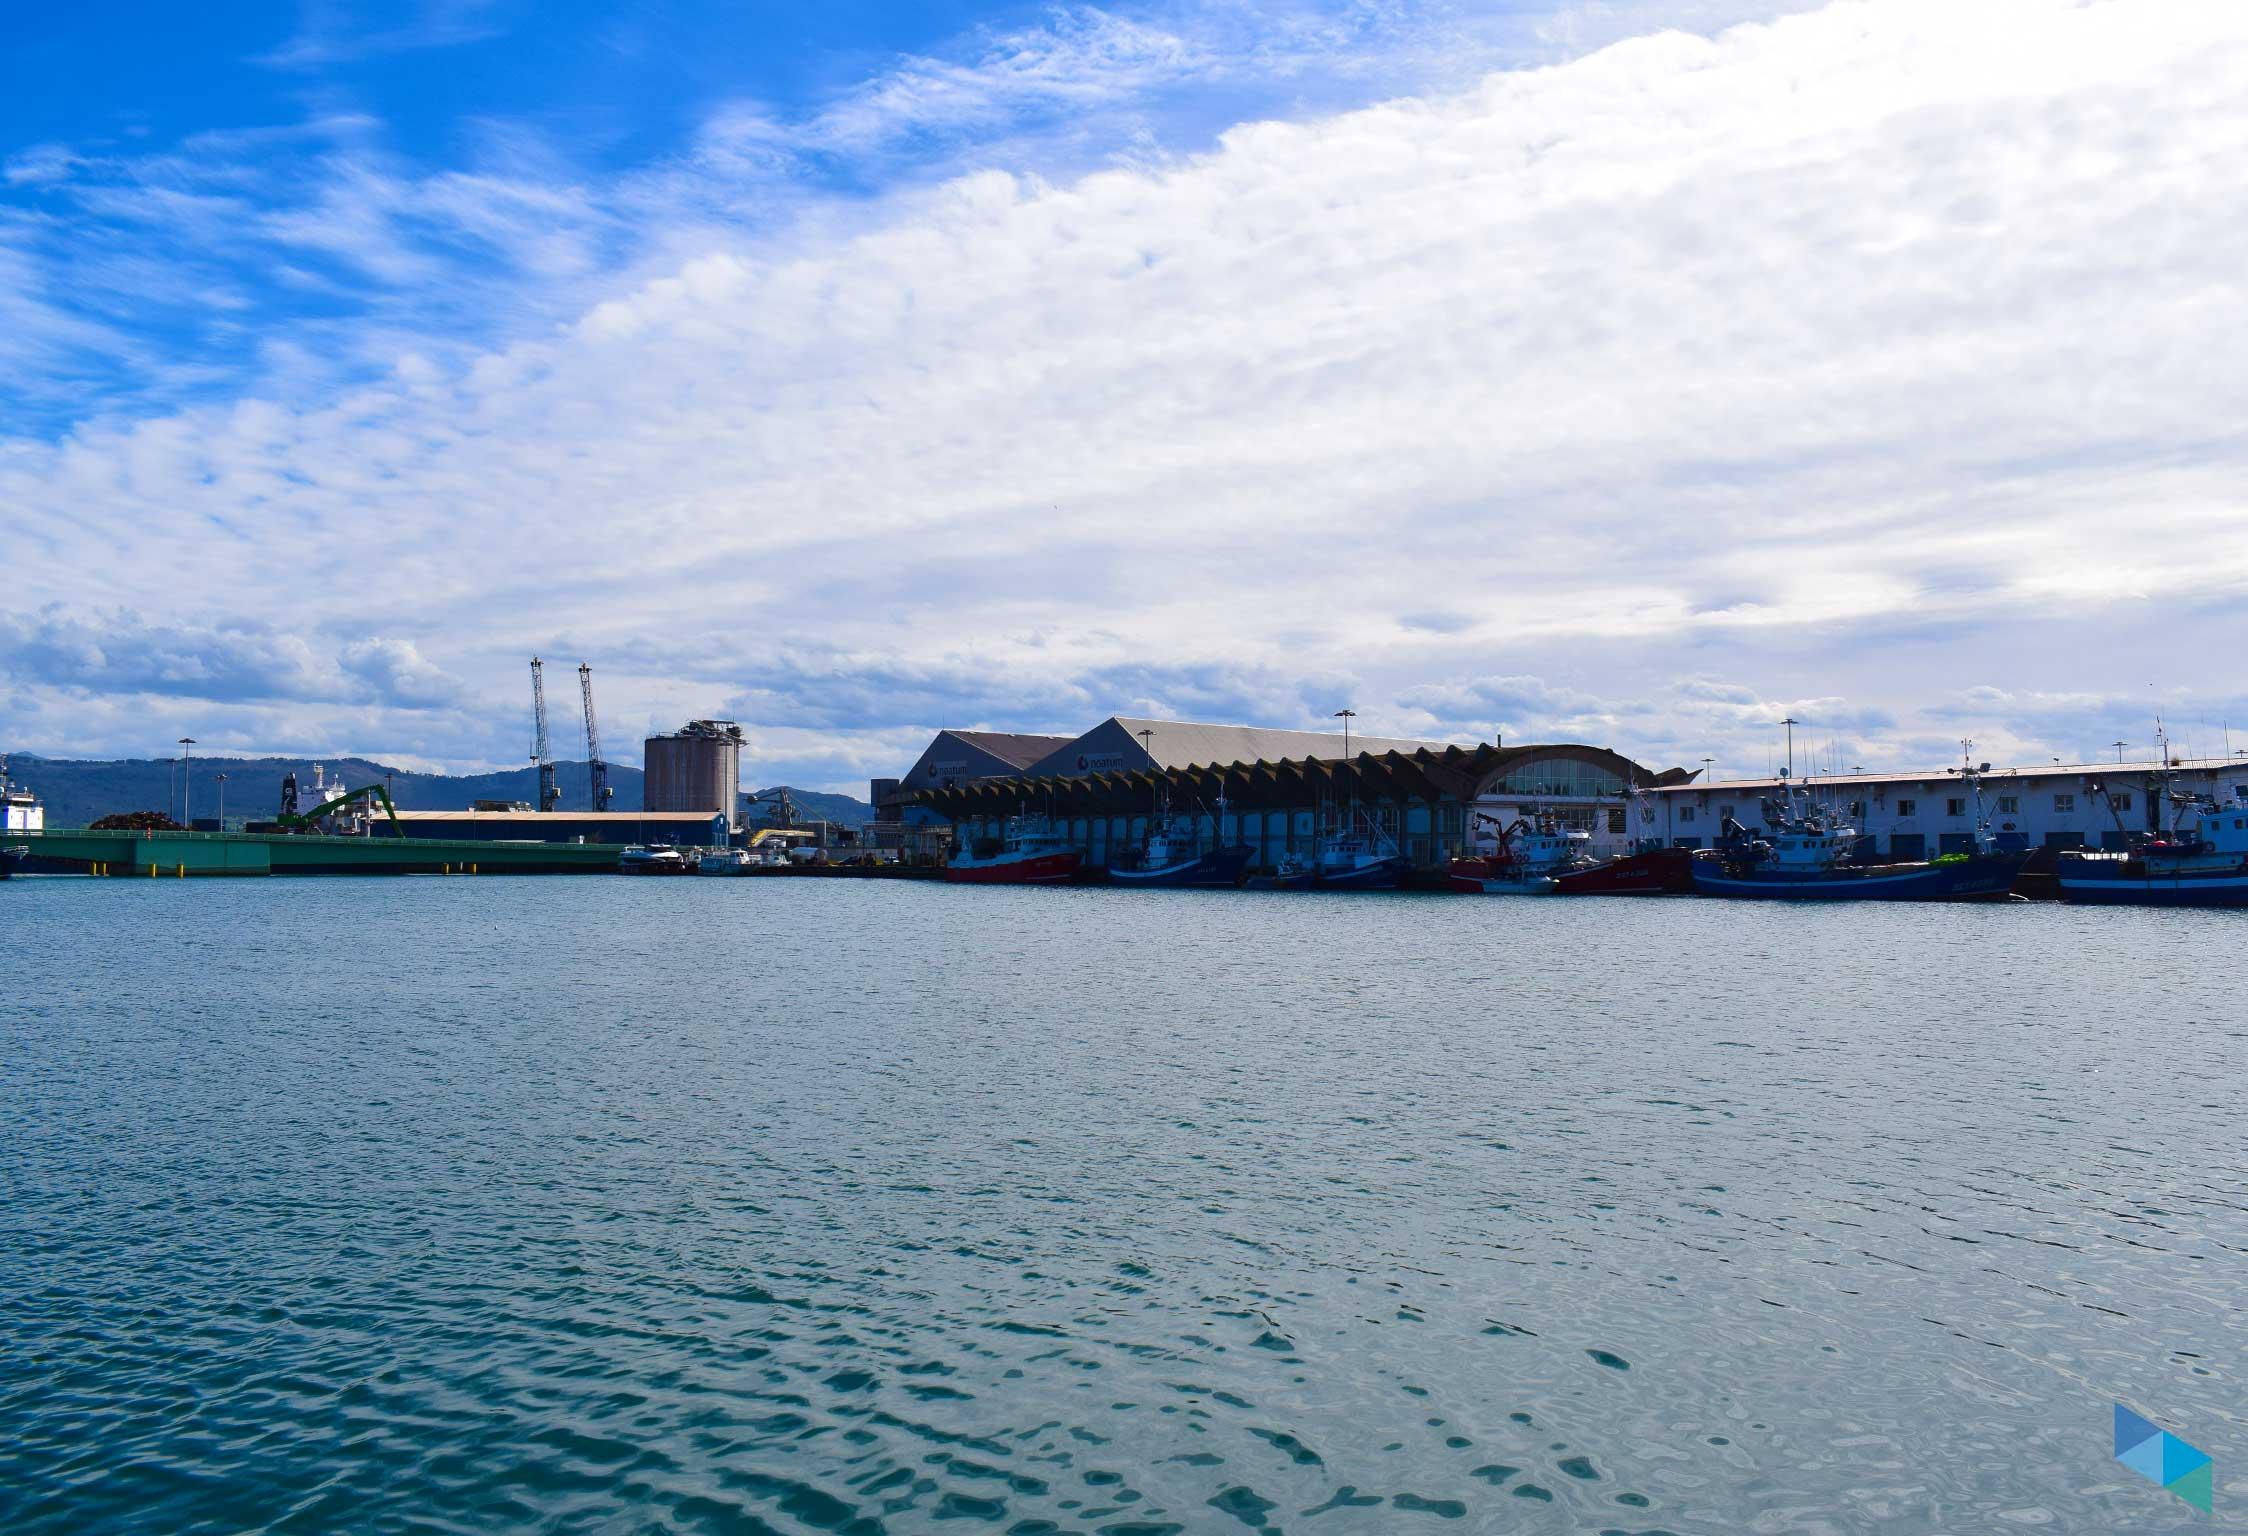 Lonja de pescado Santander